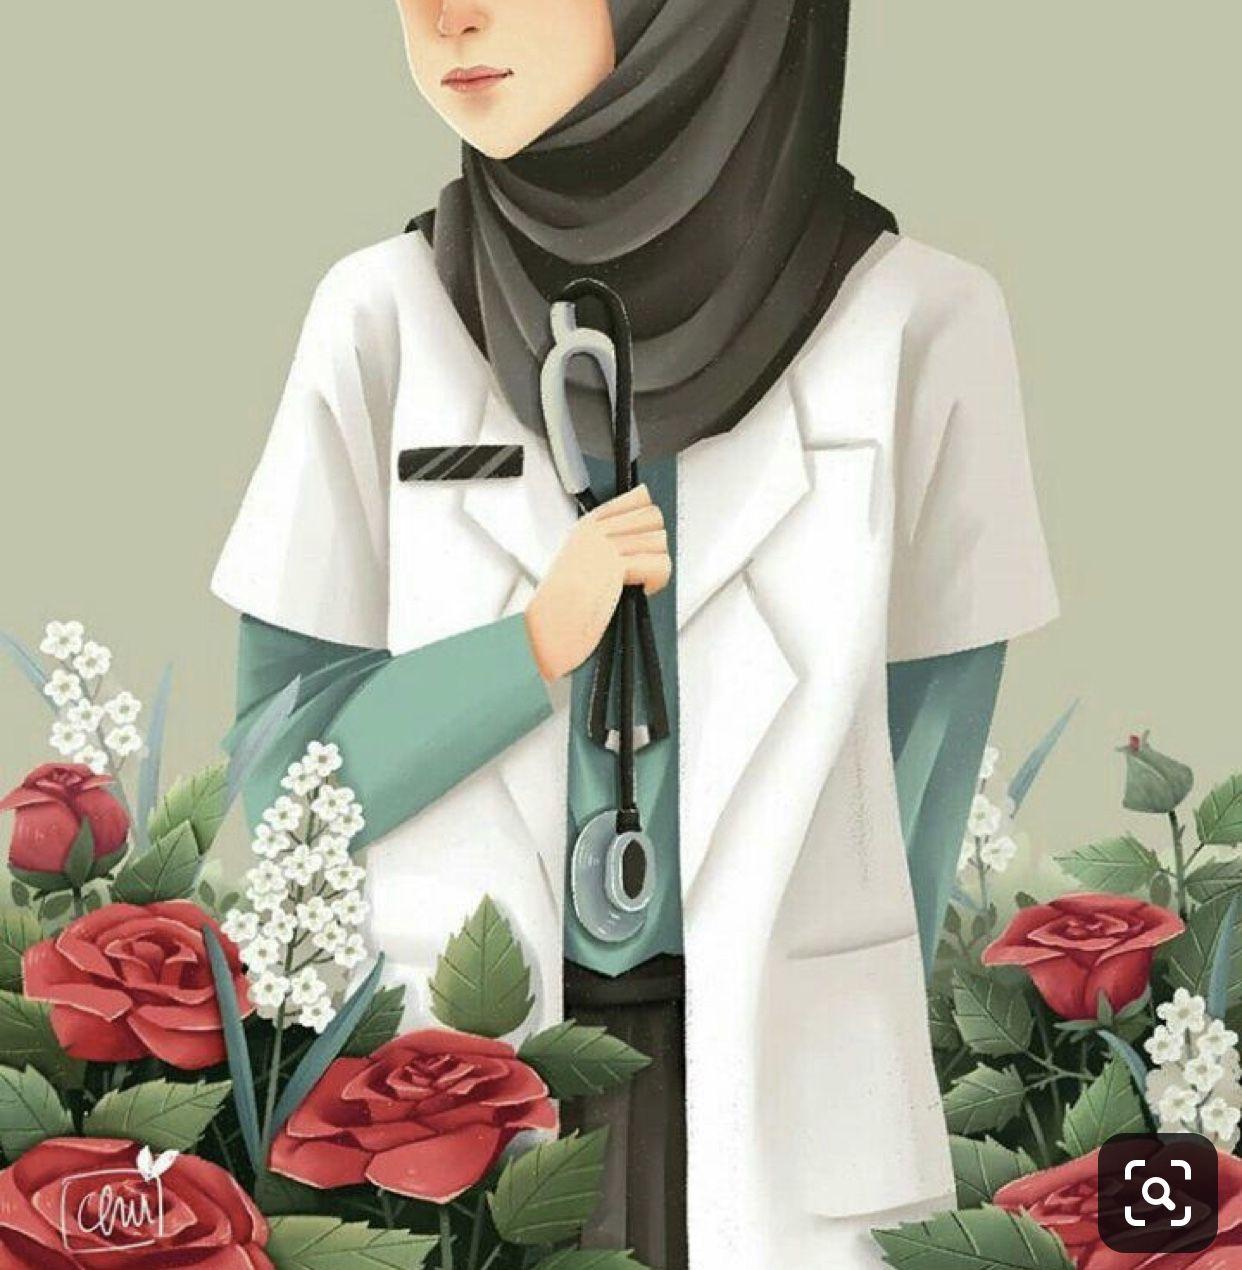 خلفيات بنات محجبات للموبايل 2019 فوتوجرافر Hijab Hipster Muslim Fashion Hijab Arab Girls Hijab